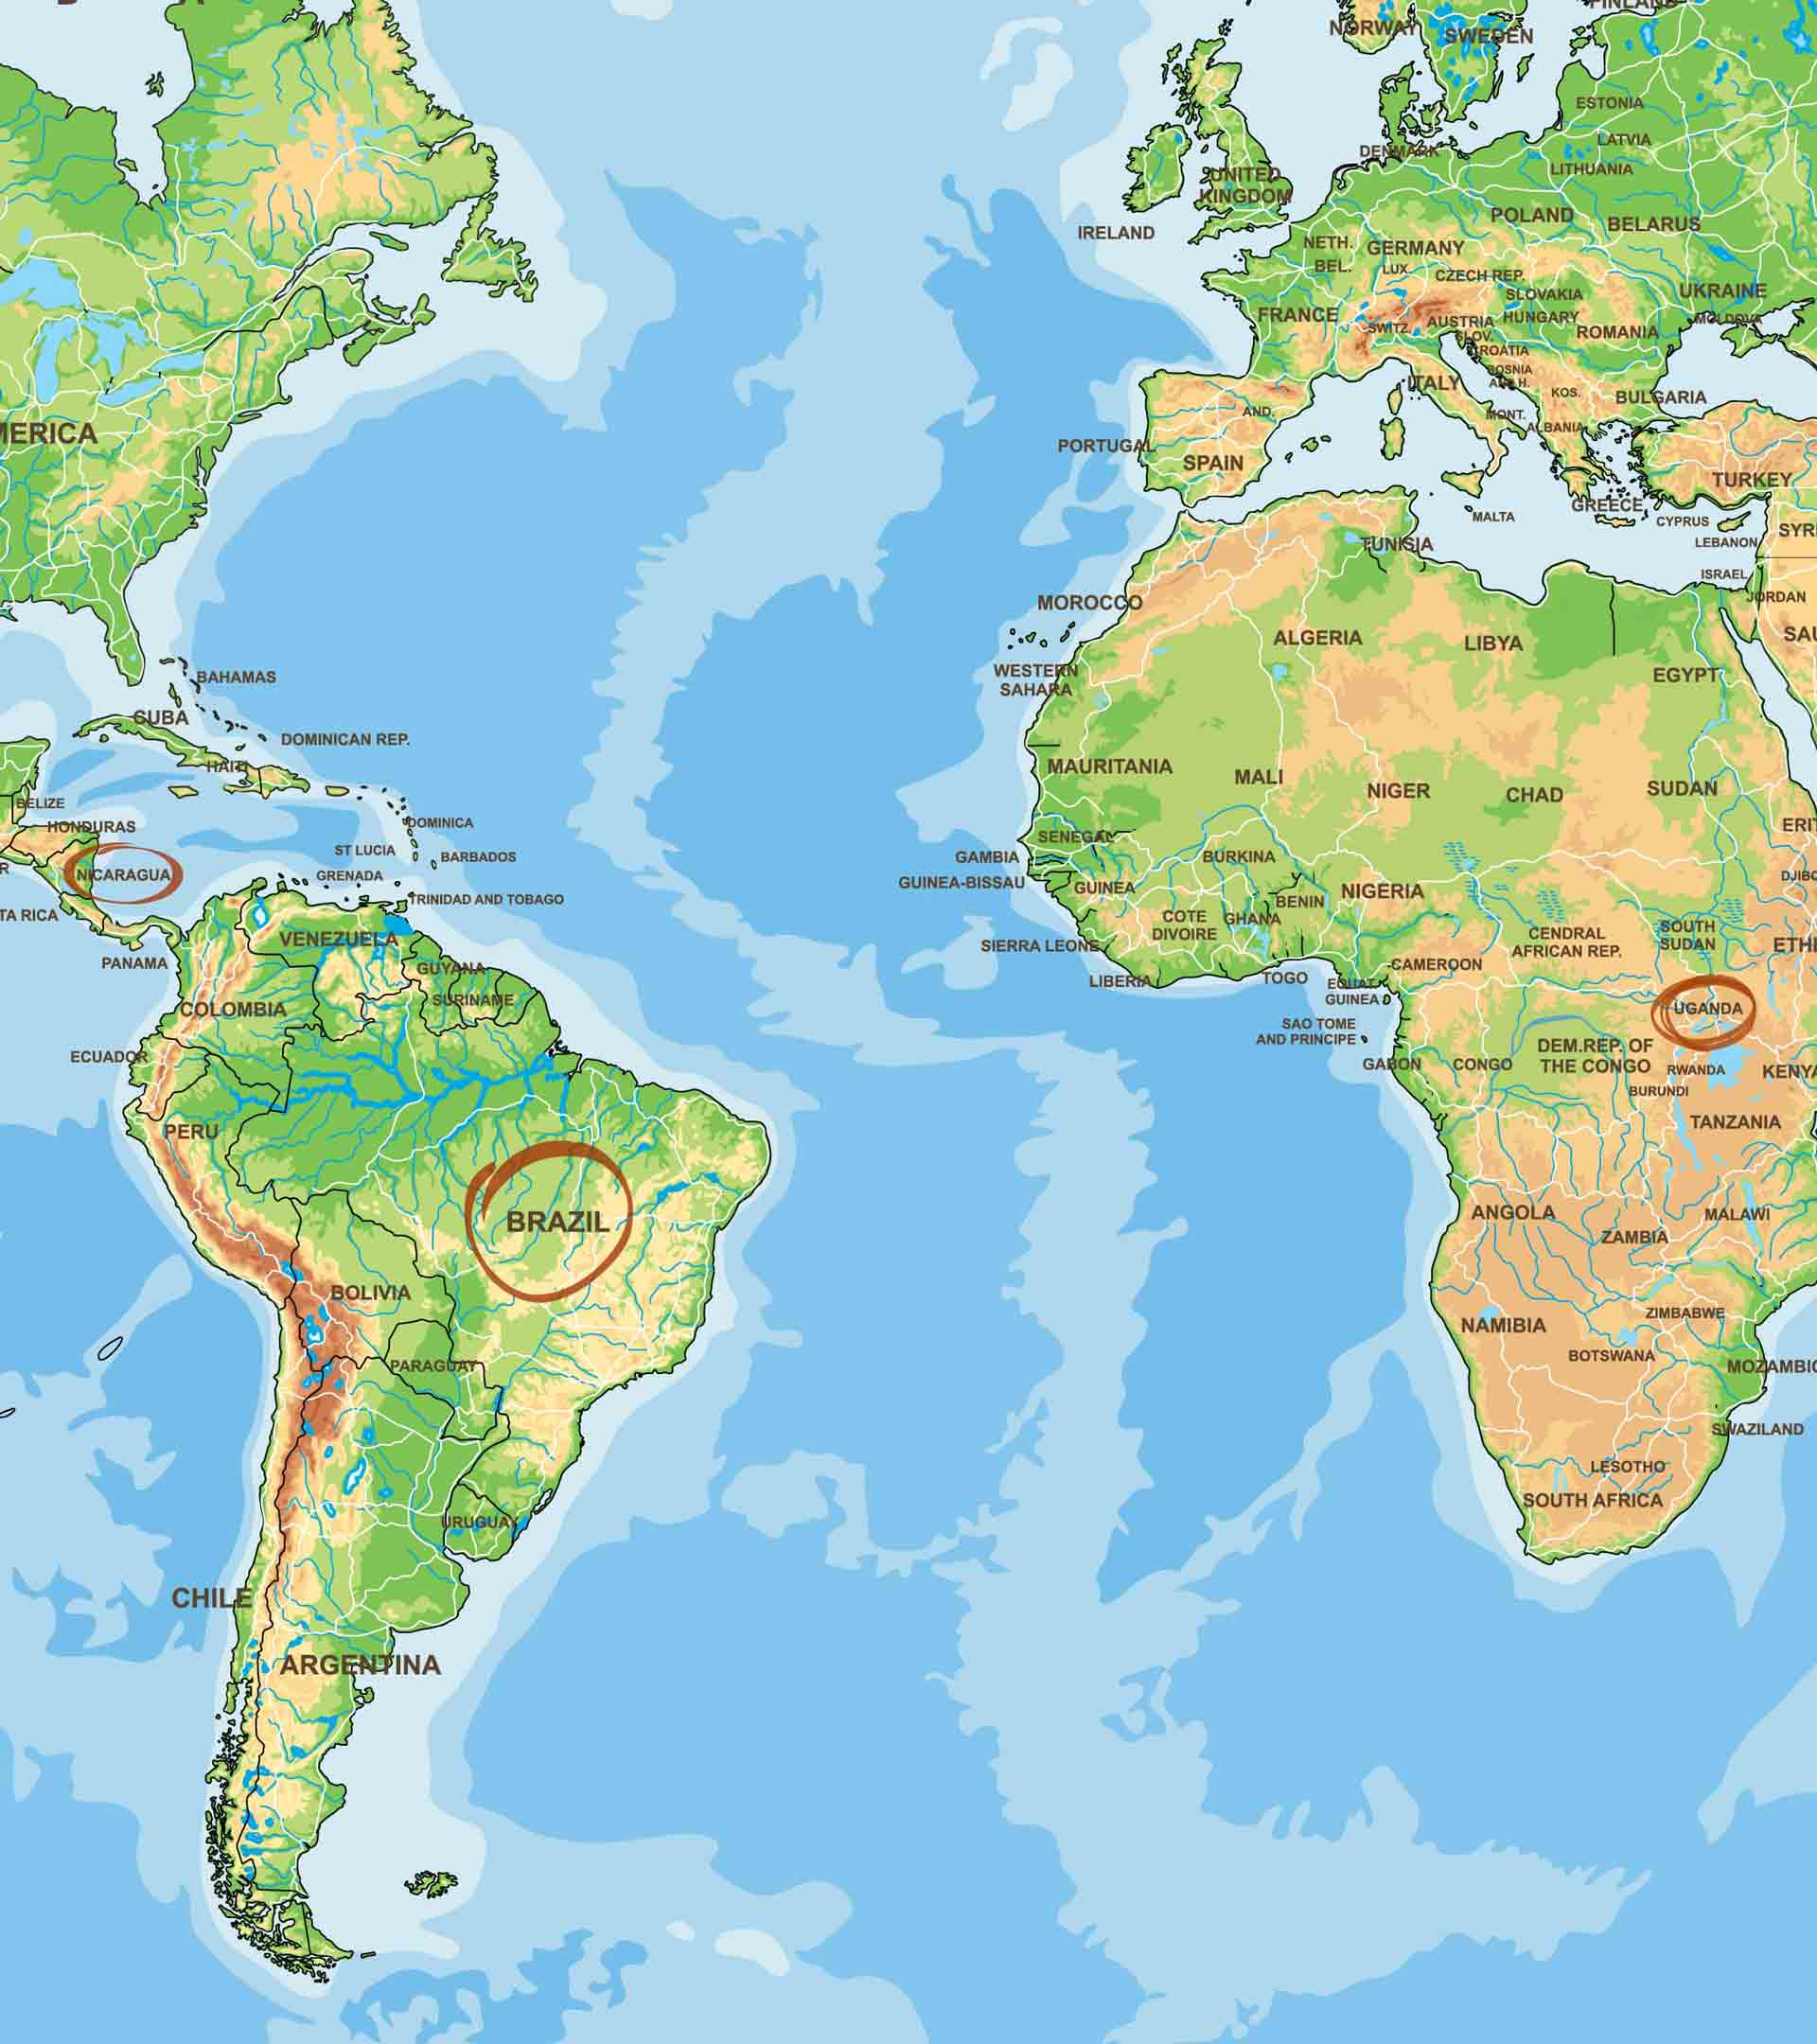 Brasilien, Nicaragua, Uganda Kaffeeanbaugebiete